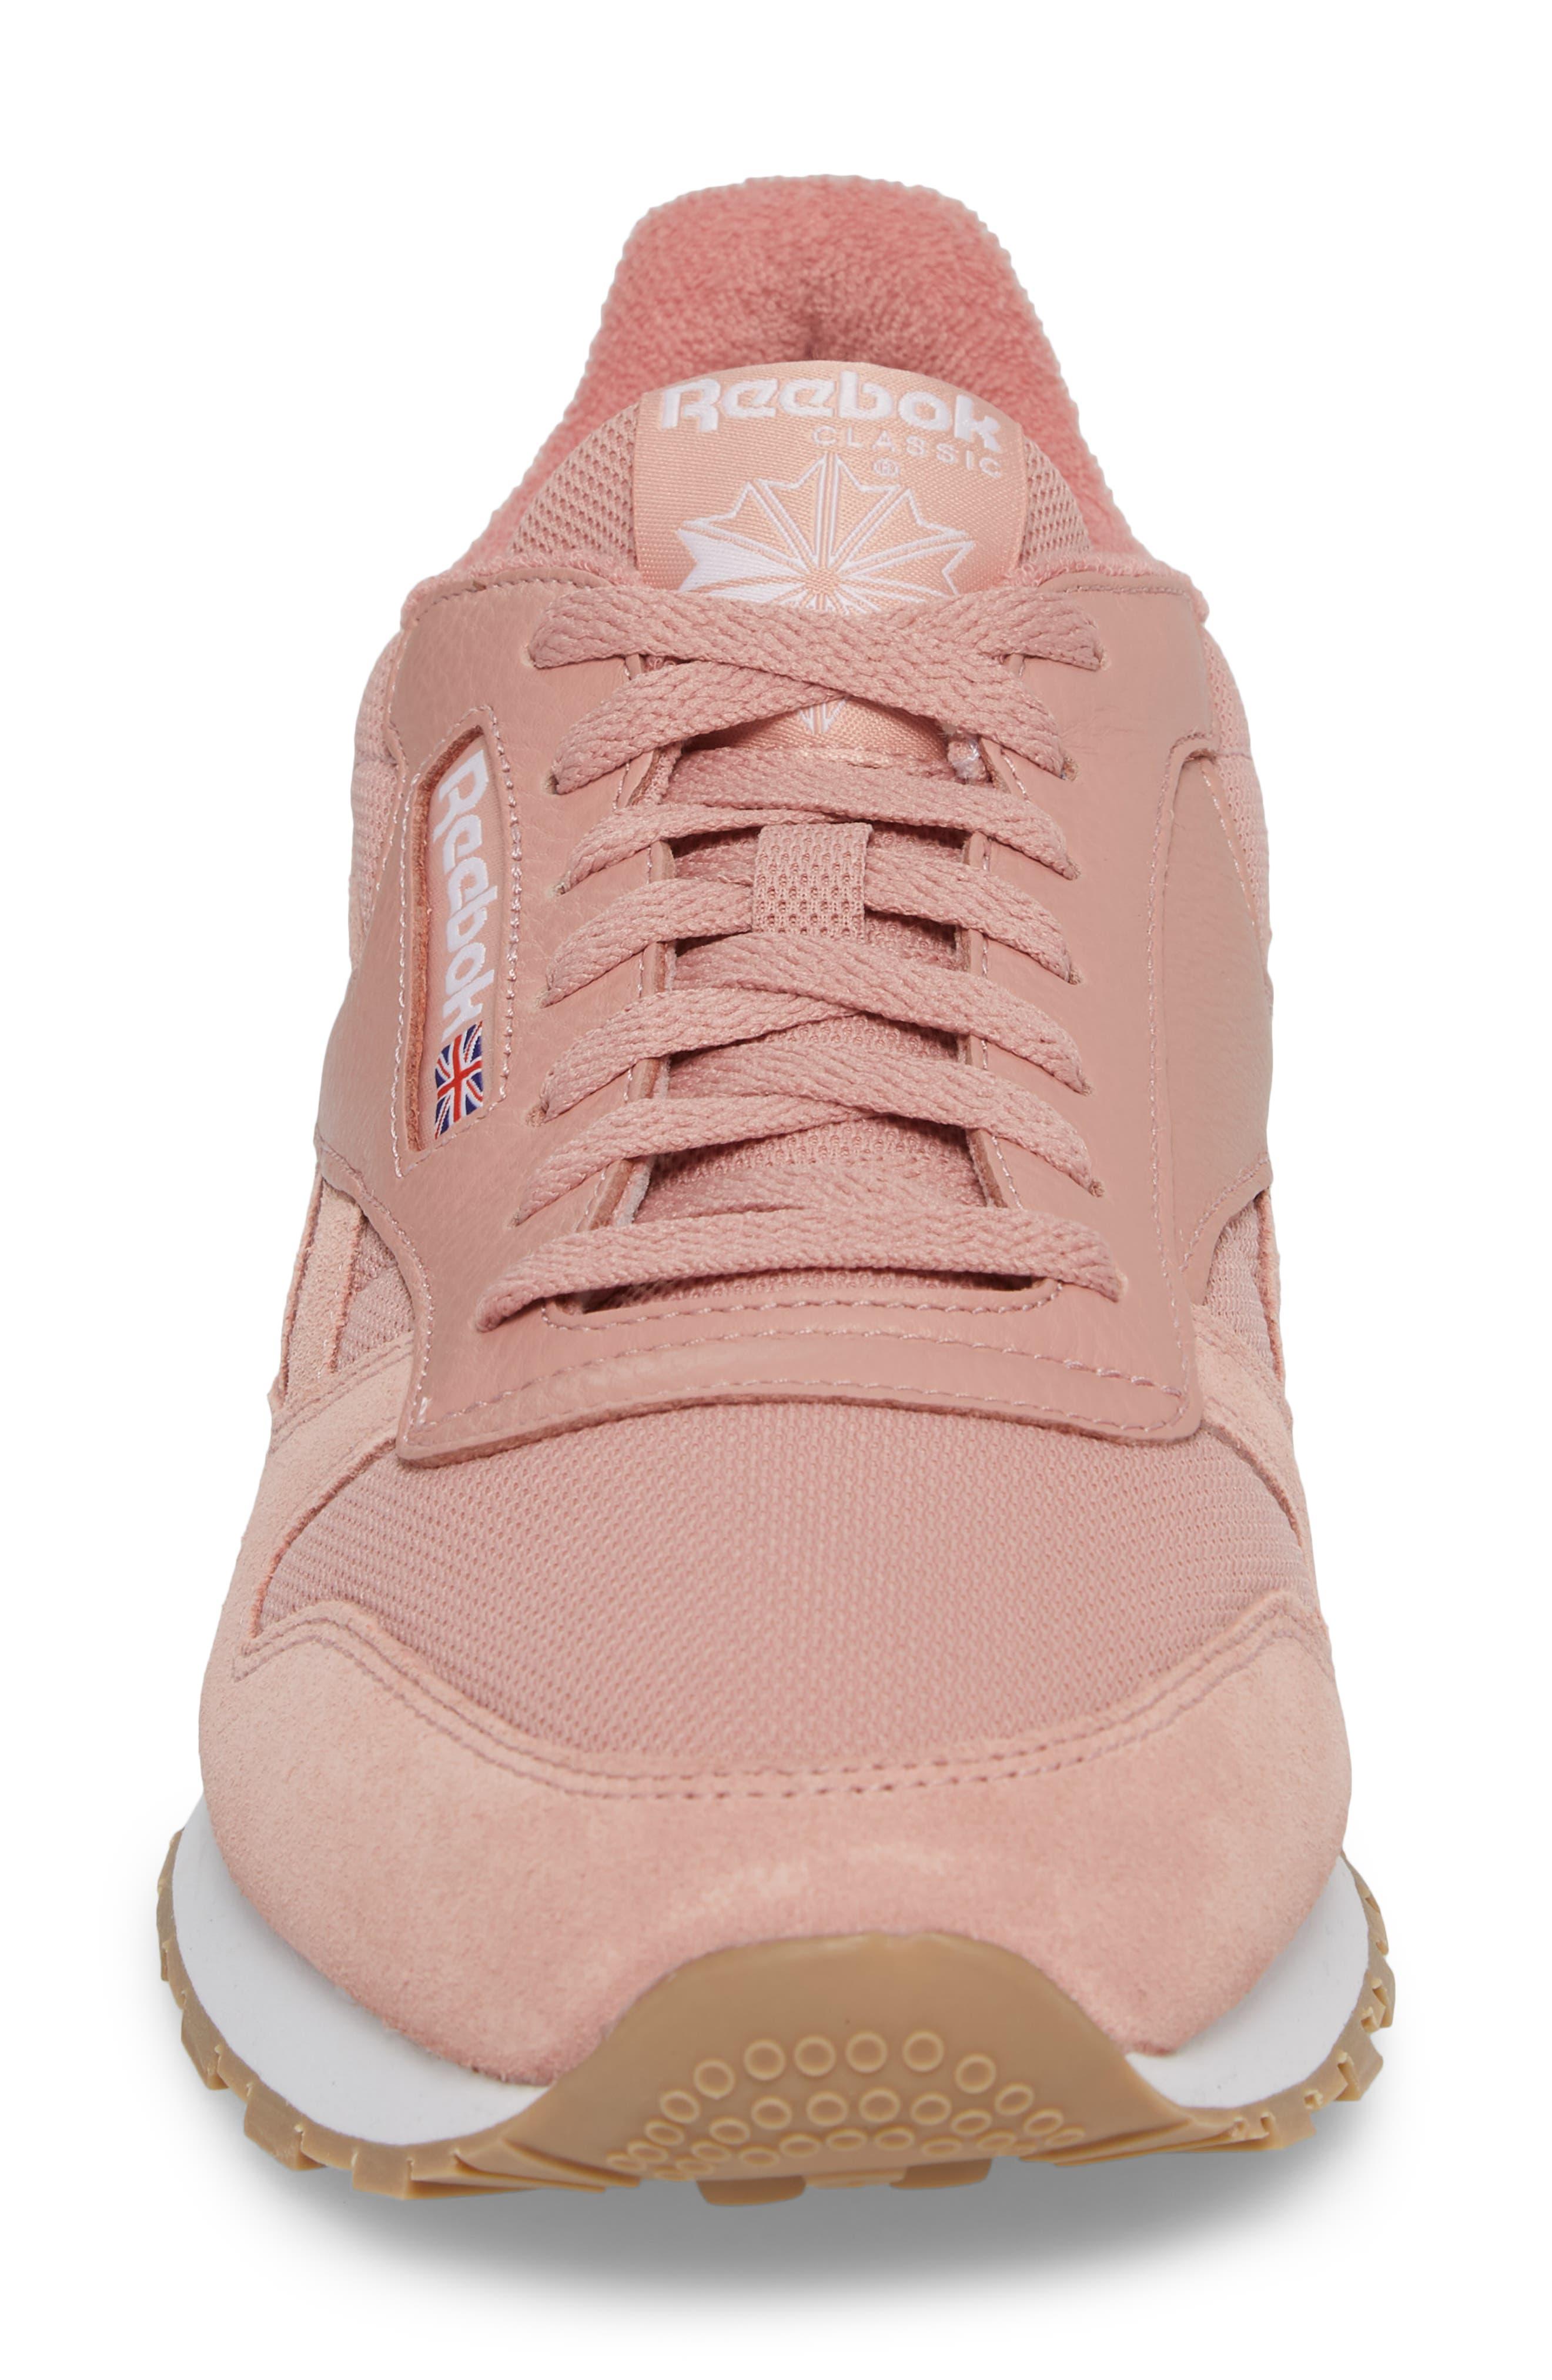 ESTL Classic Leather Sneaker,                             Alternate thumbnail 4, color,                             CHALK PINK/ WHITE